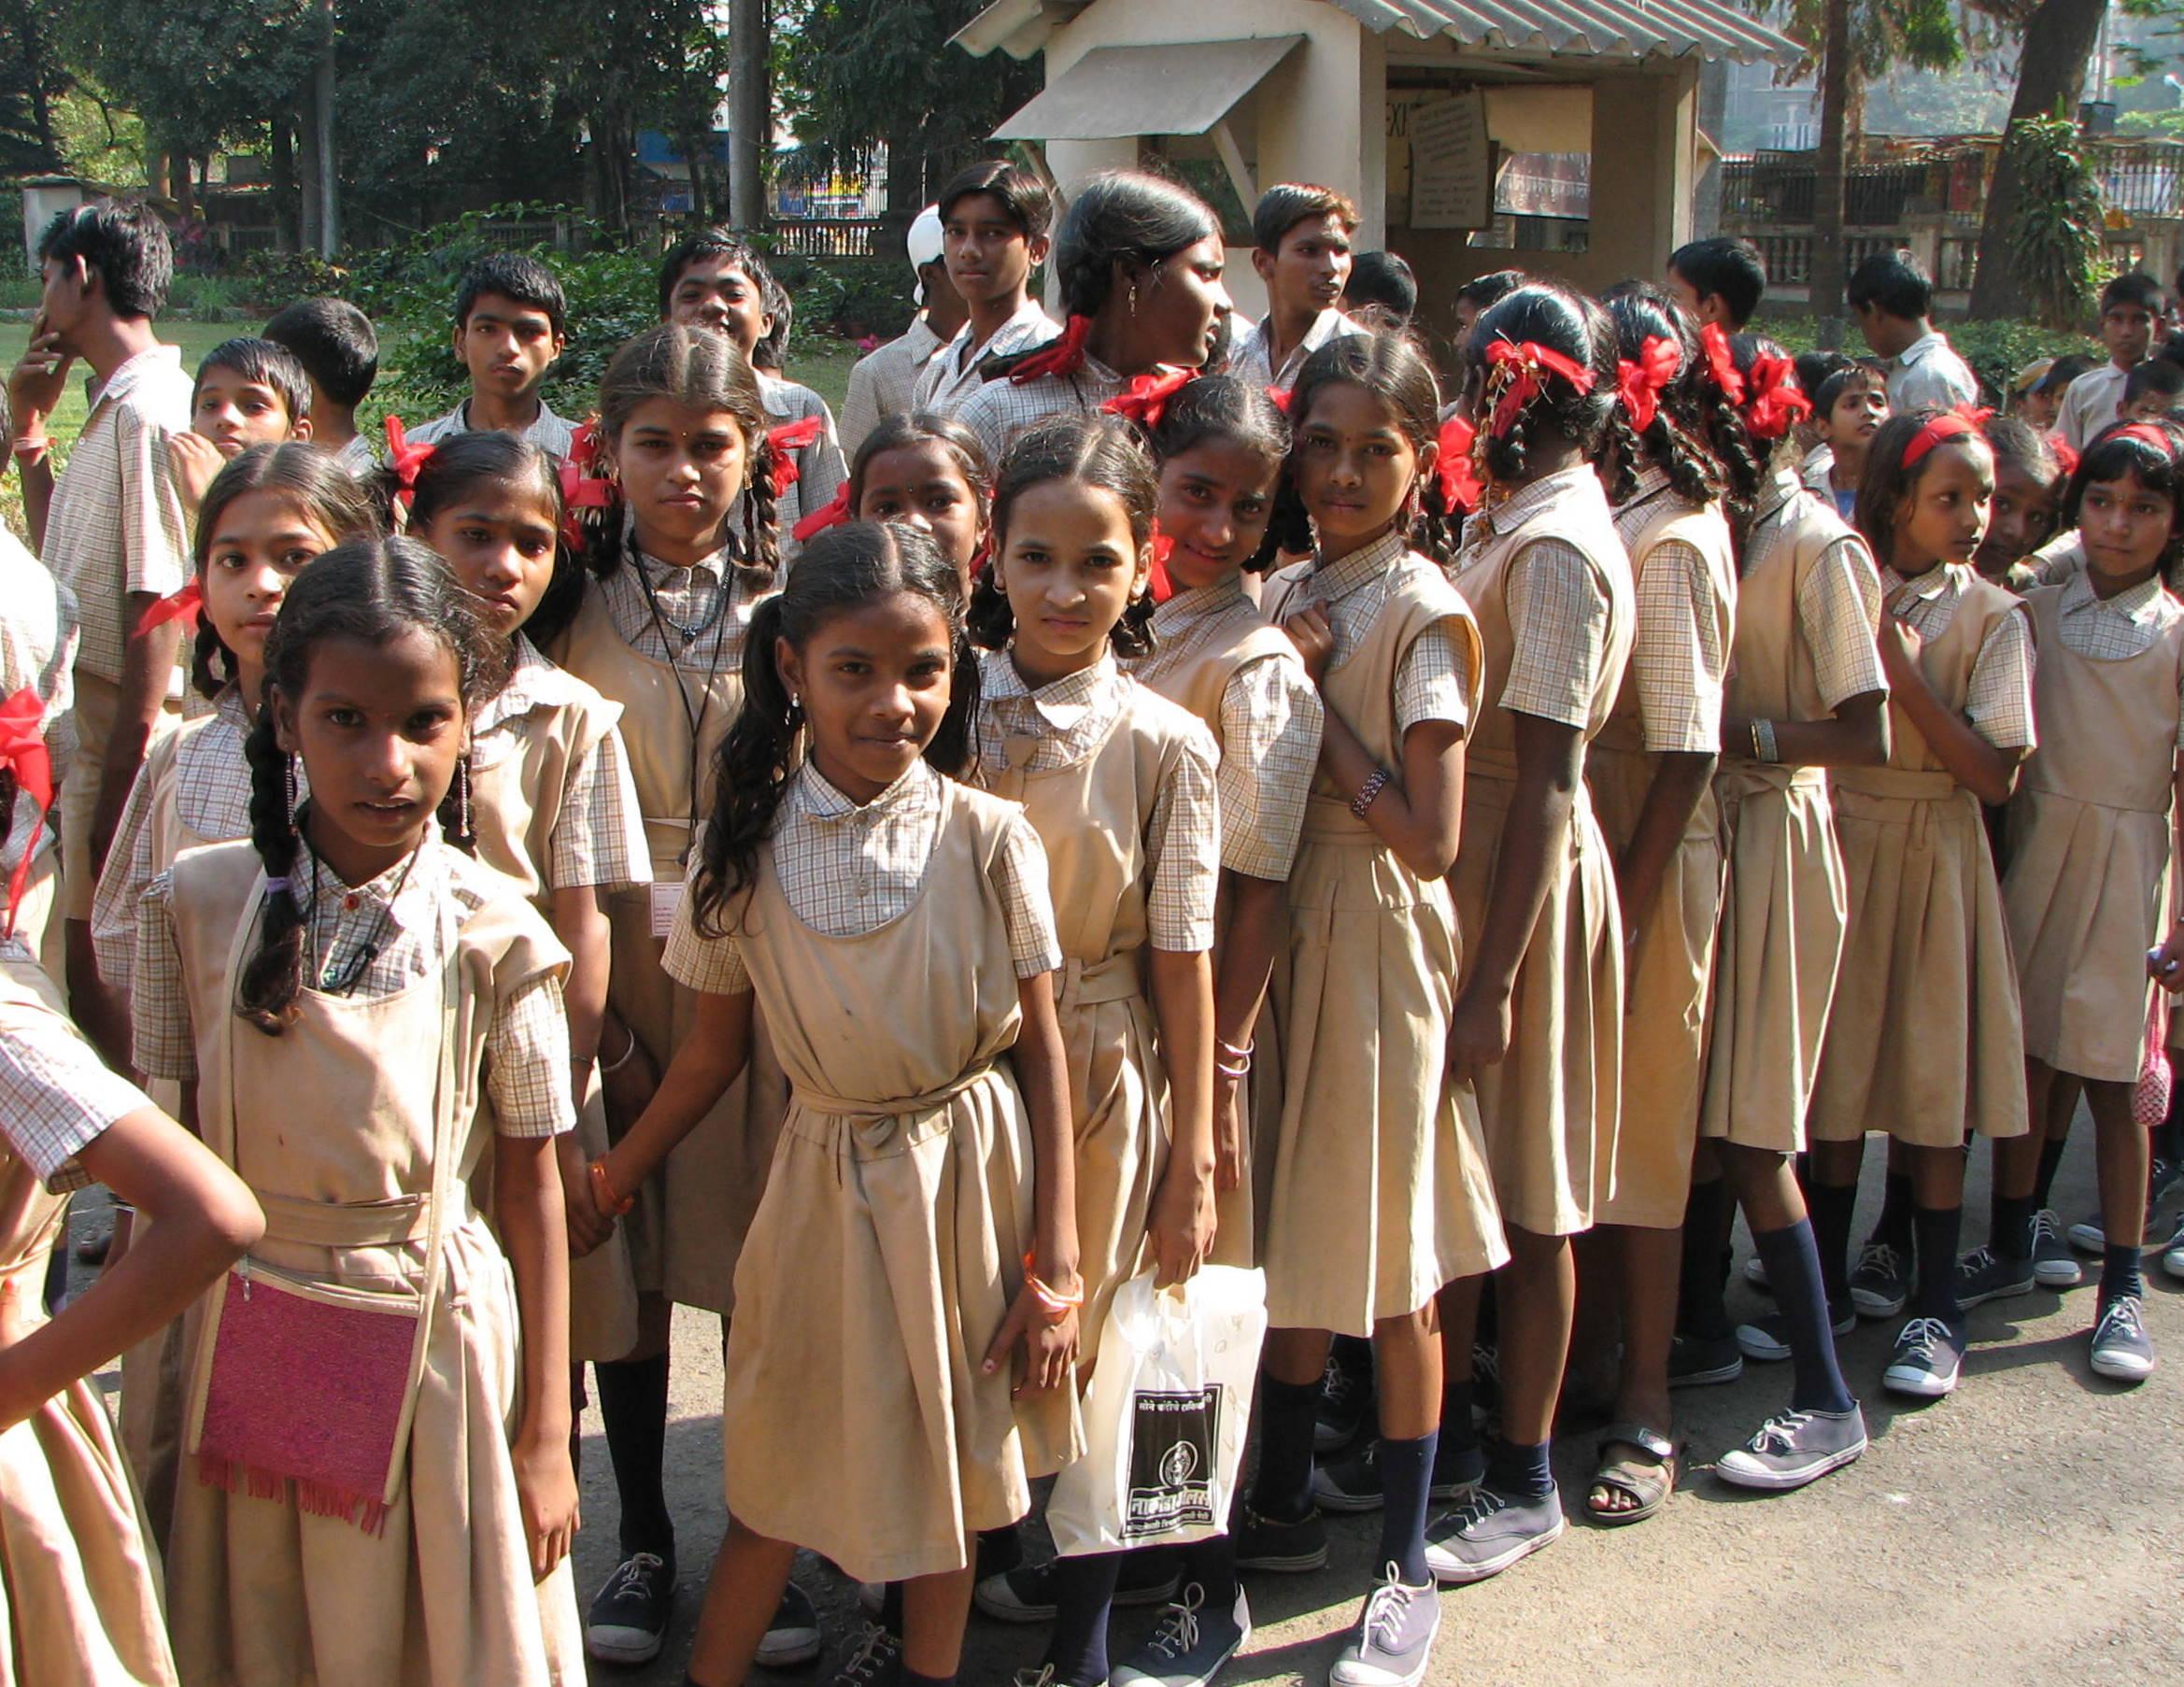 essay on importance of uniform